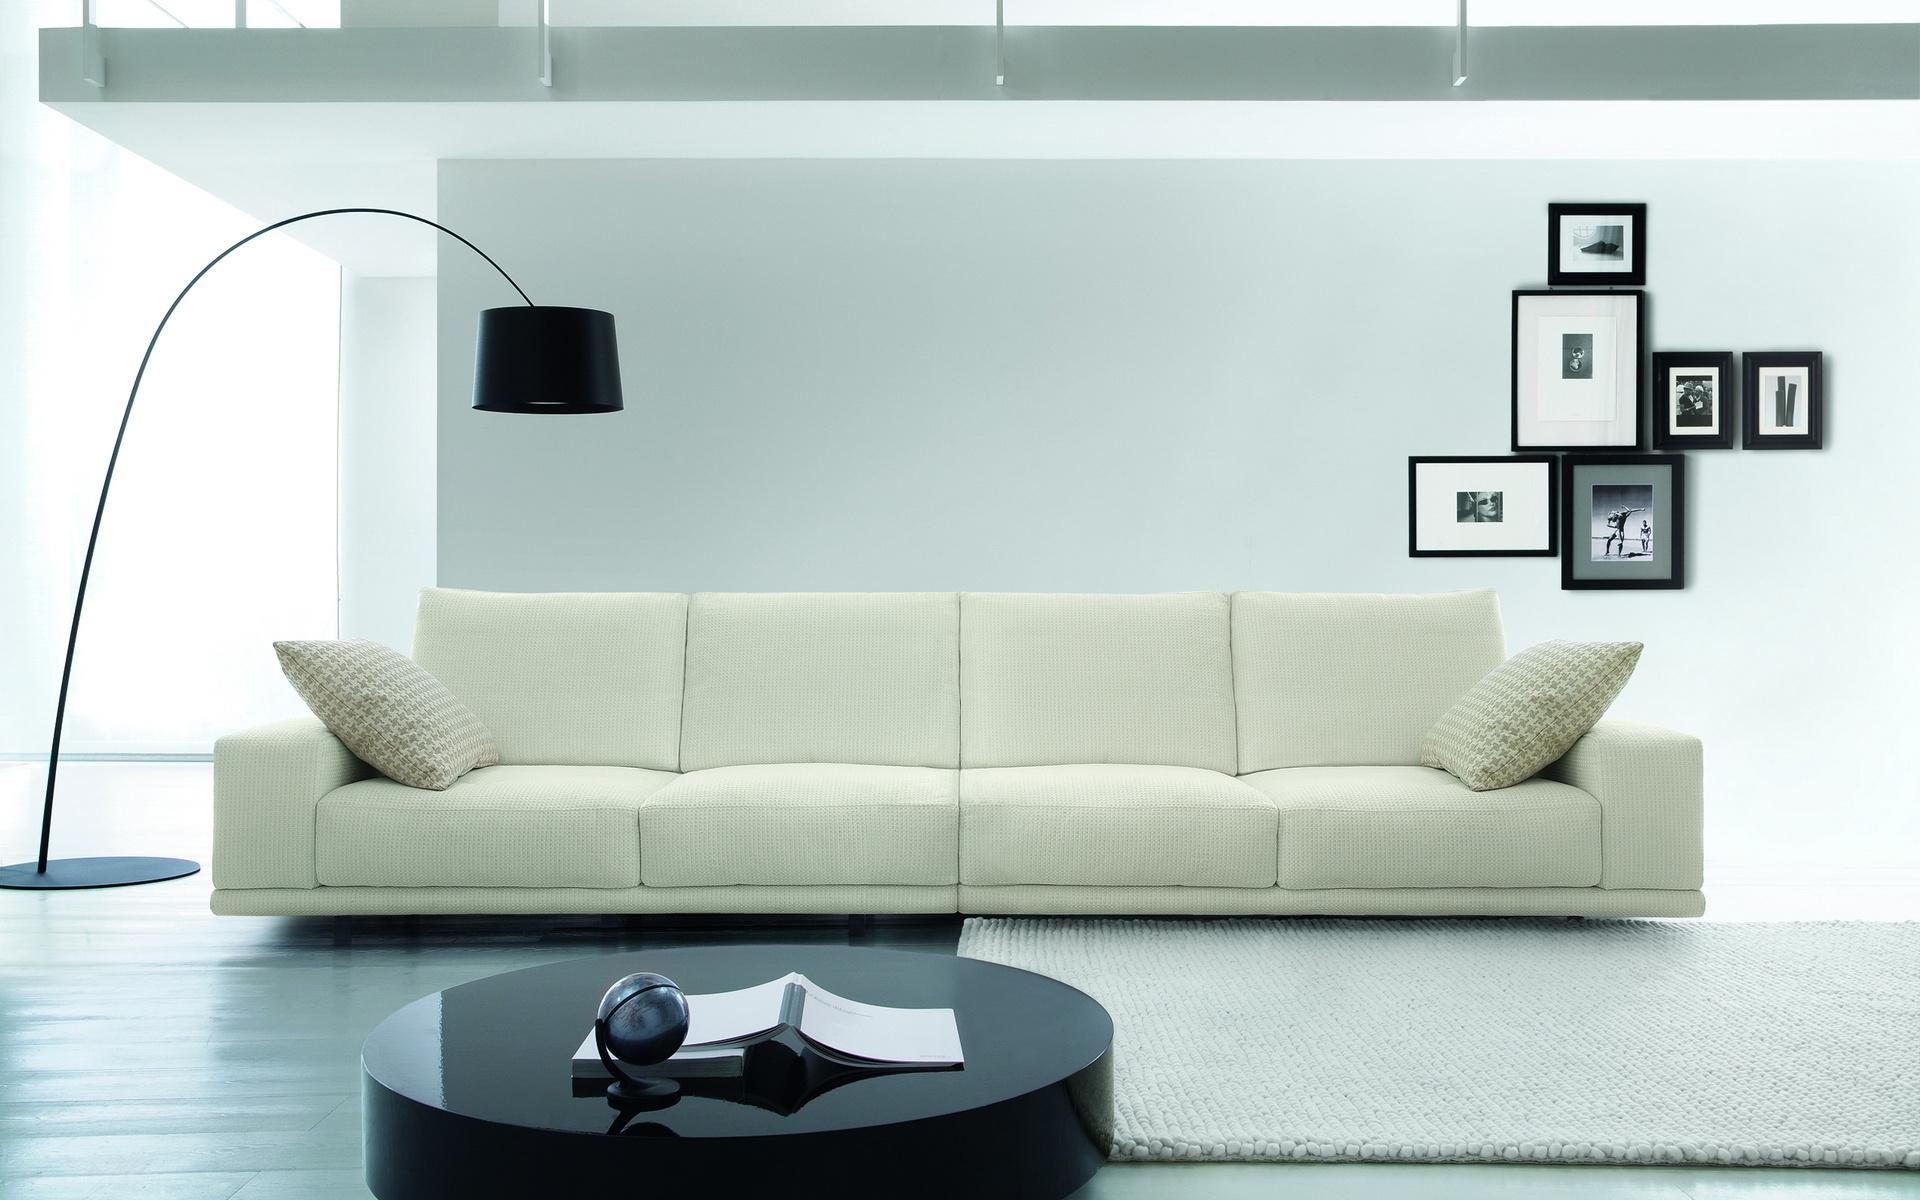 furniture computer wallpapers desktop - photo #1